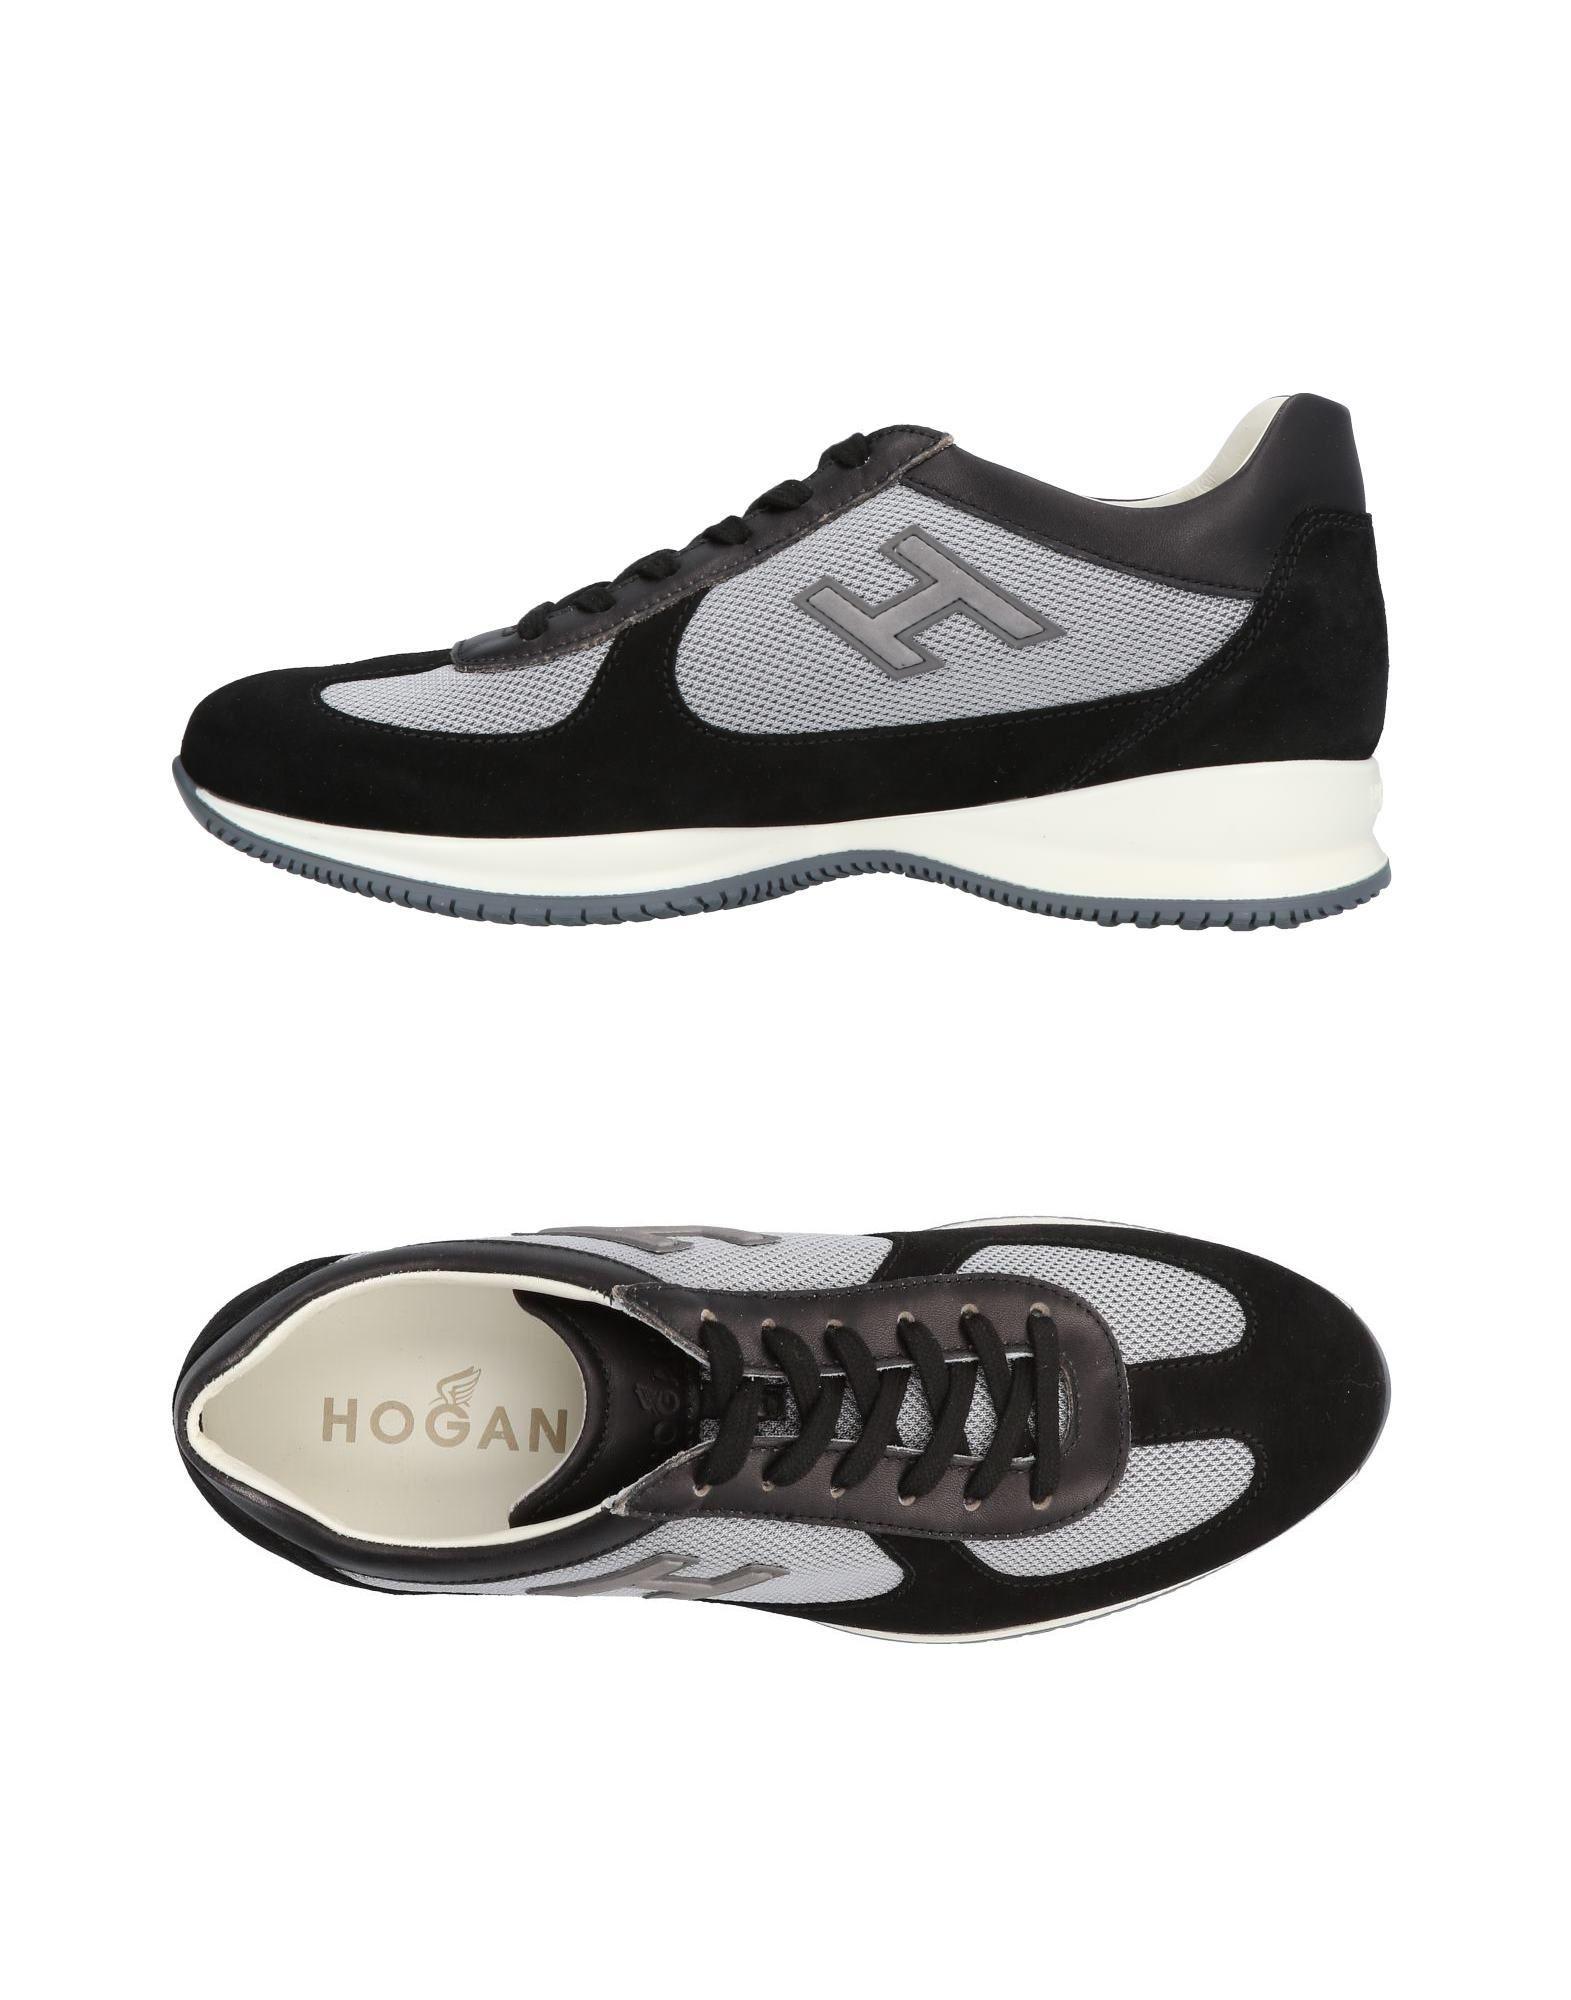 Hogan Sneakers Herren  11416945CQ Gute Qualität beliebte Schuhe